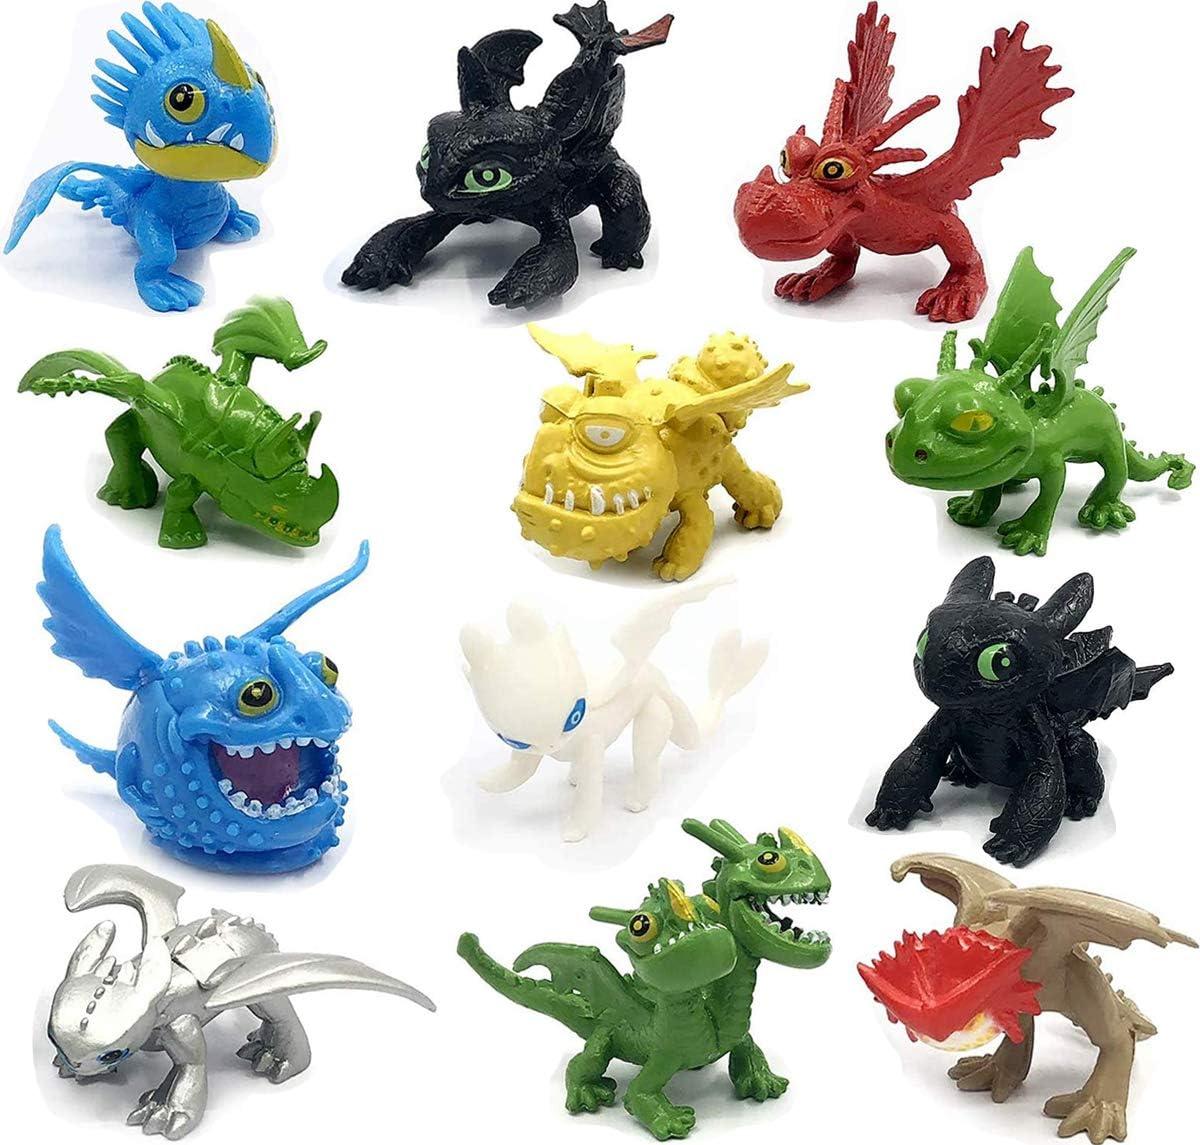 Amazon Com Dragon Toys Mini Figures Action Figures 12 Pcs How To Train Your Dragon 12pcs Set 5 6 5cm Pvc Action Figures Toy Doll Night Fury Toothless Dragon Cake Topper Toys Games